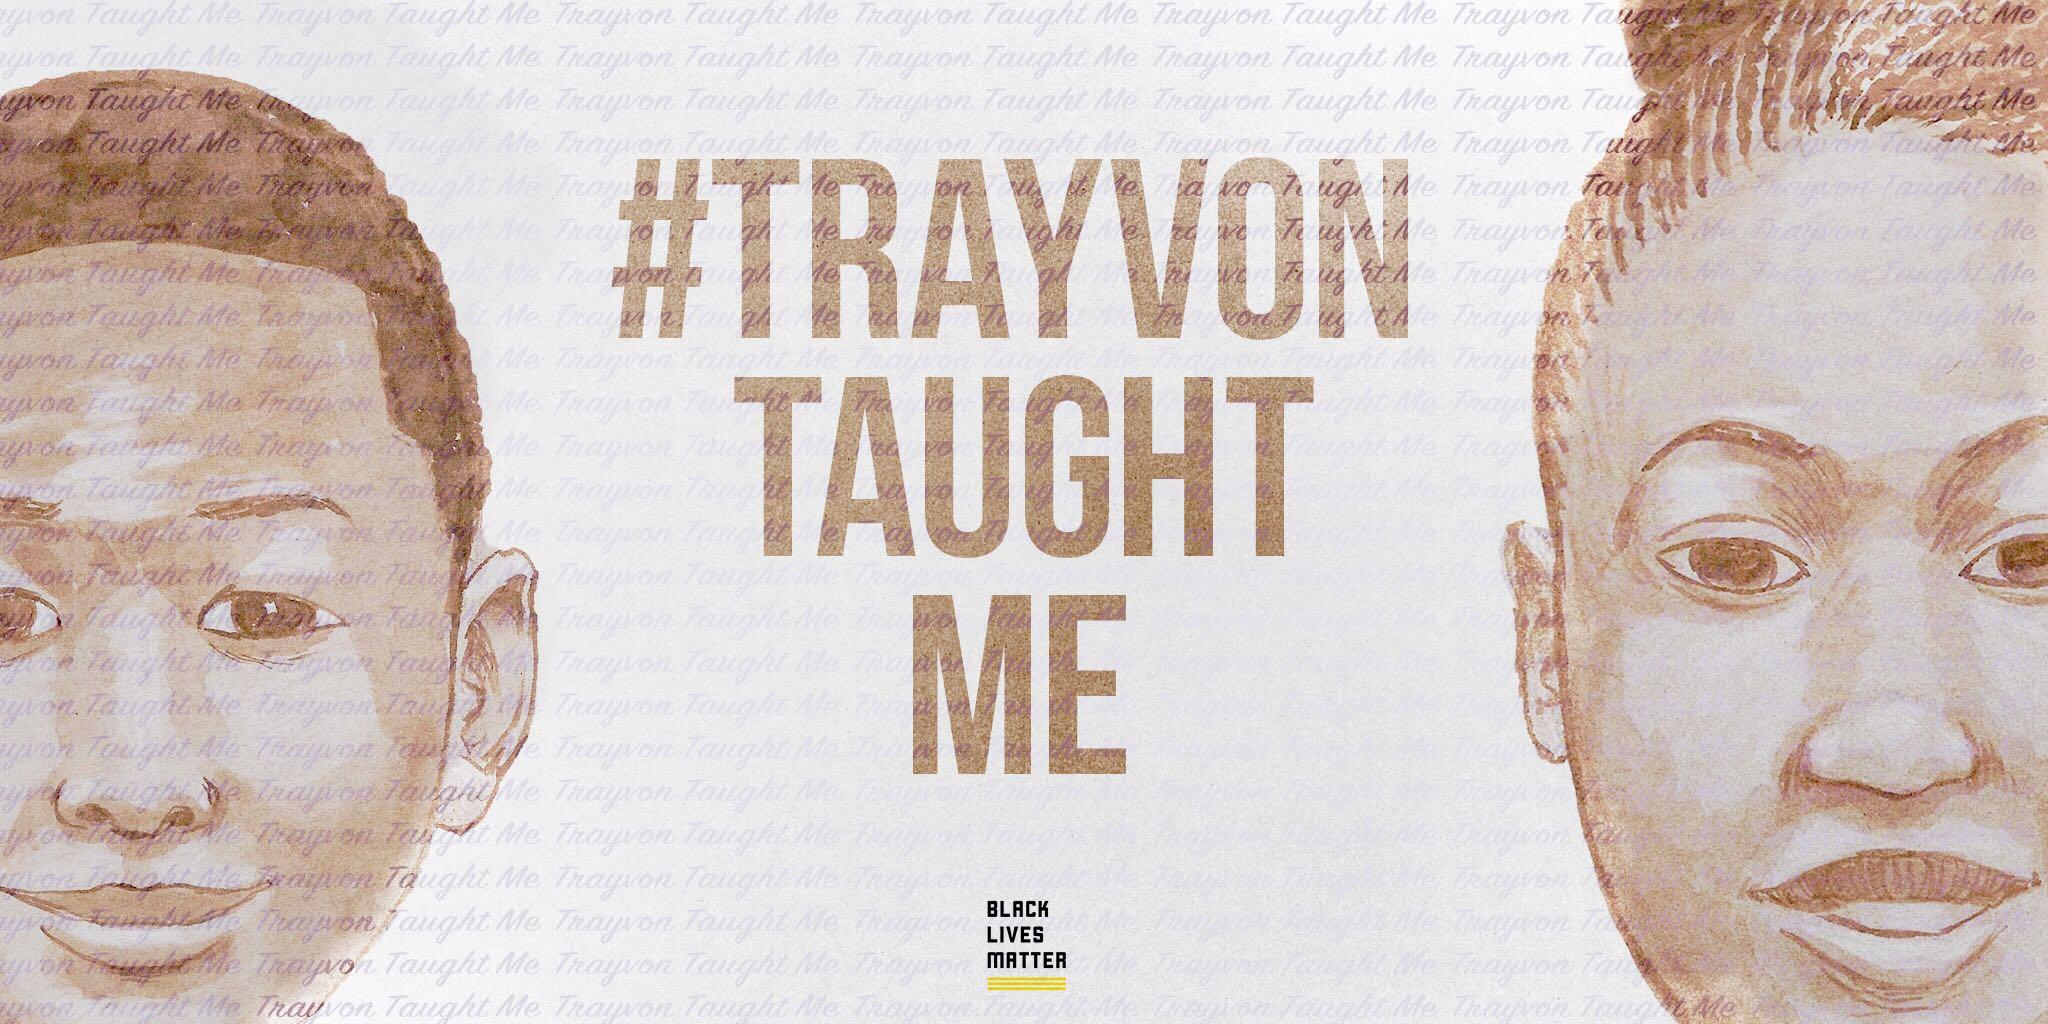 #trayvontaughtme